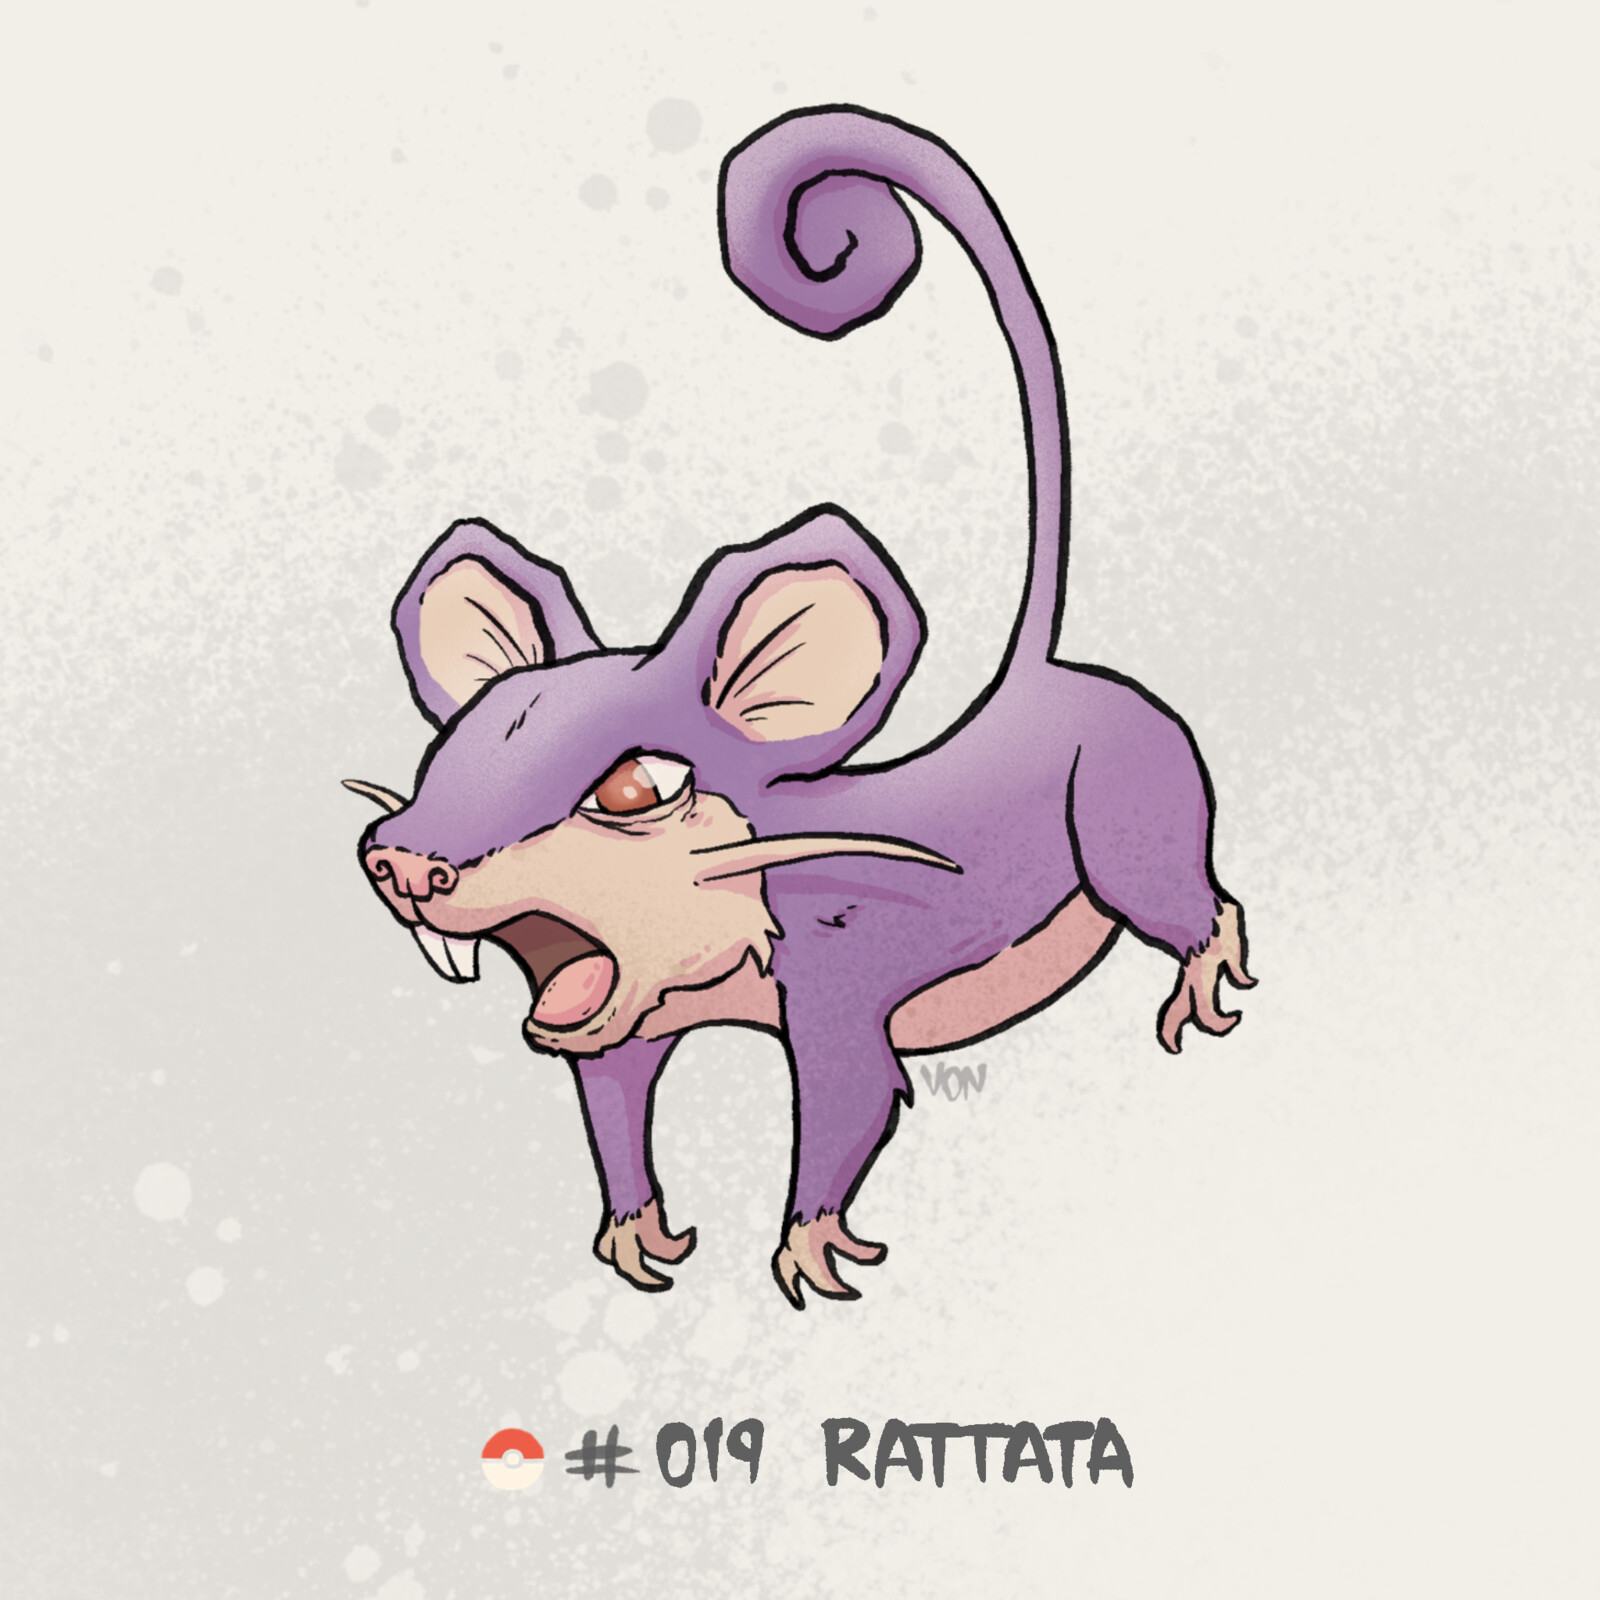 #019 Rattata